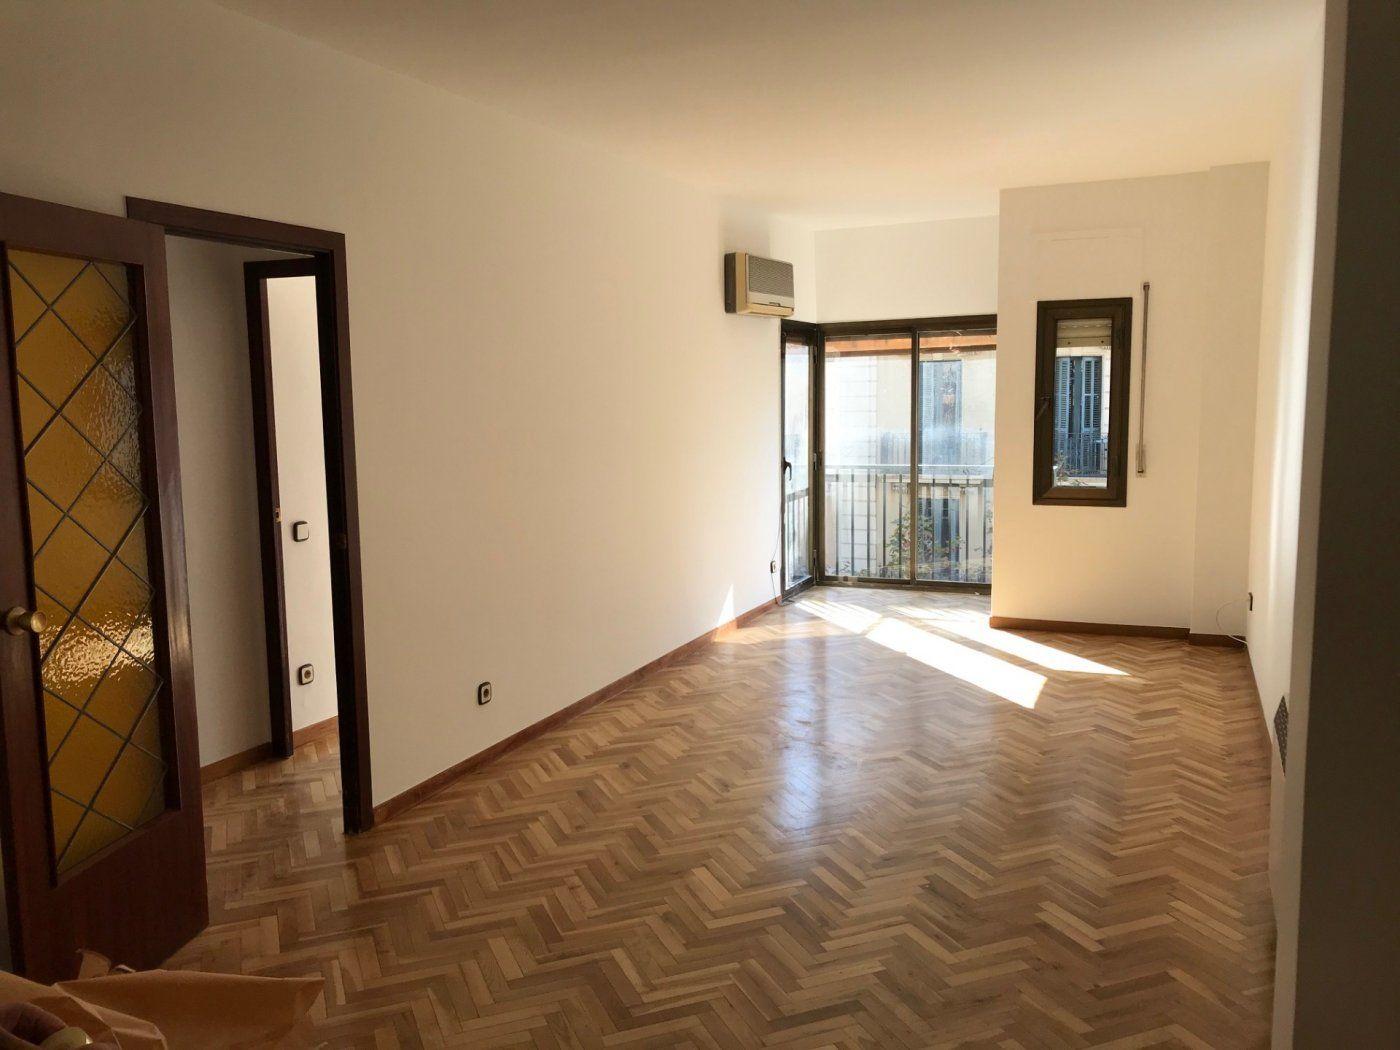 (Español) Luminoso piso en Eixample